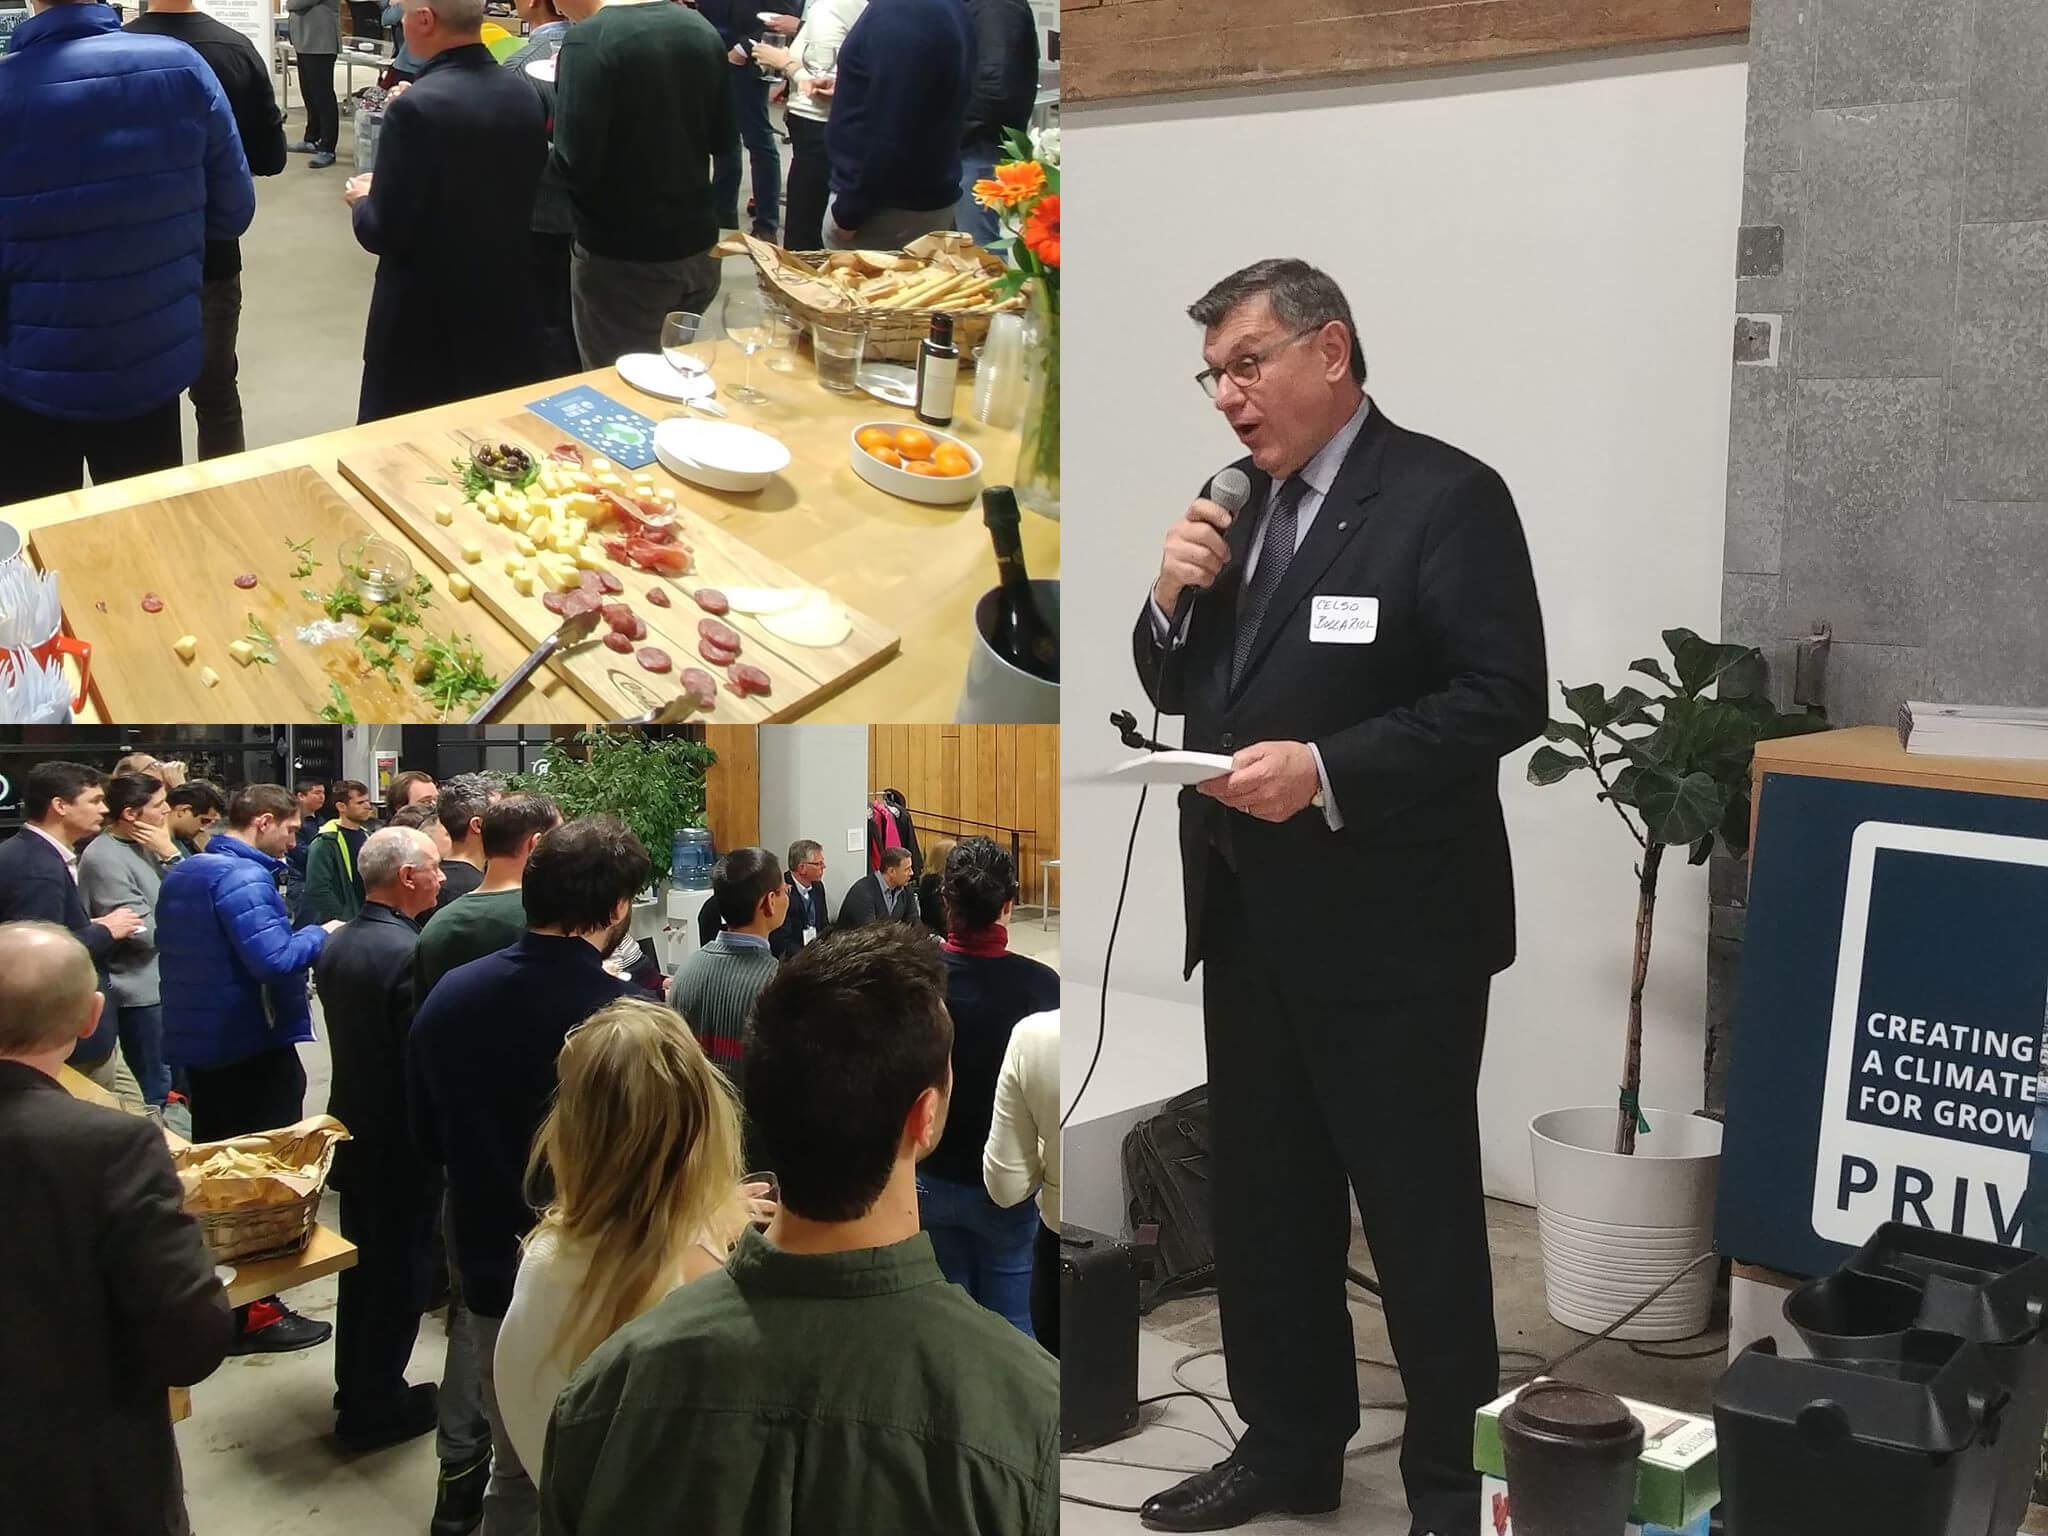 Celso Speaking At Ducdoc Event Buildex 2019 Italian Design Map (1)